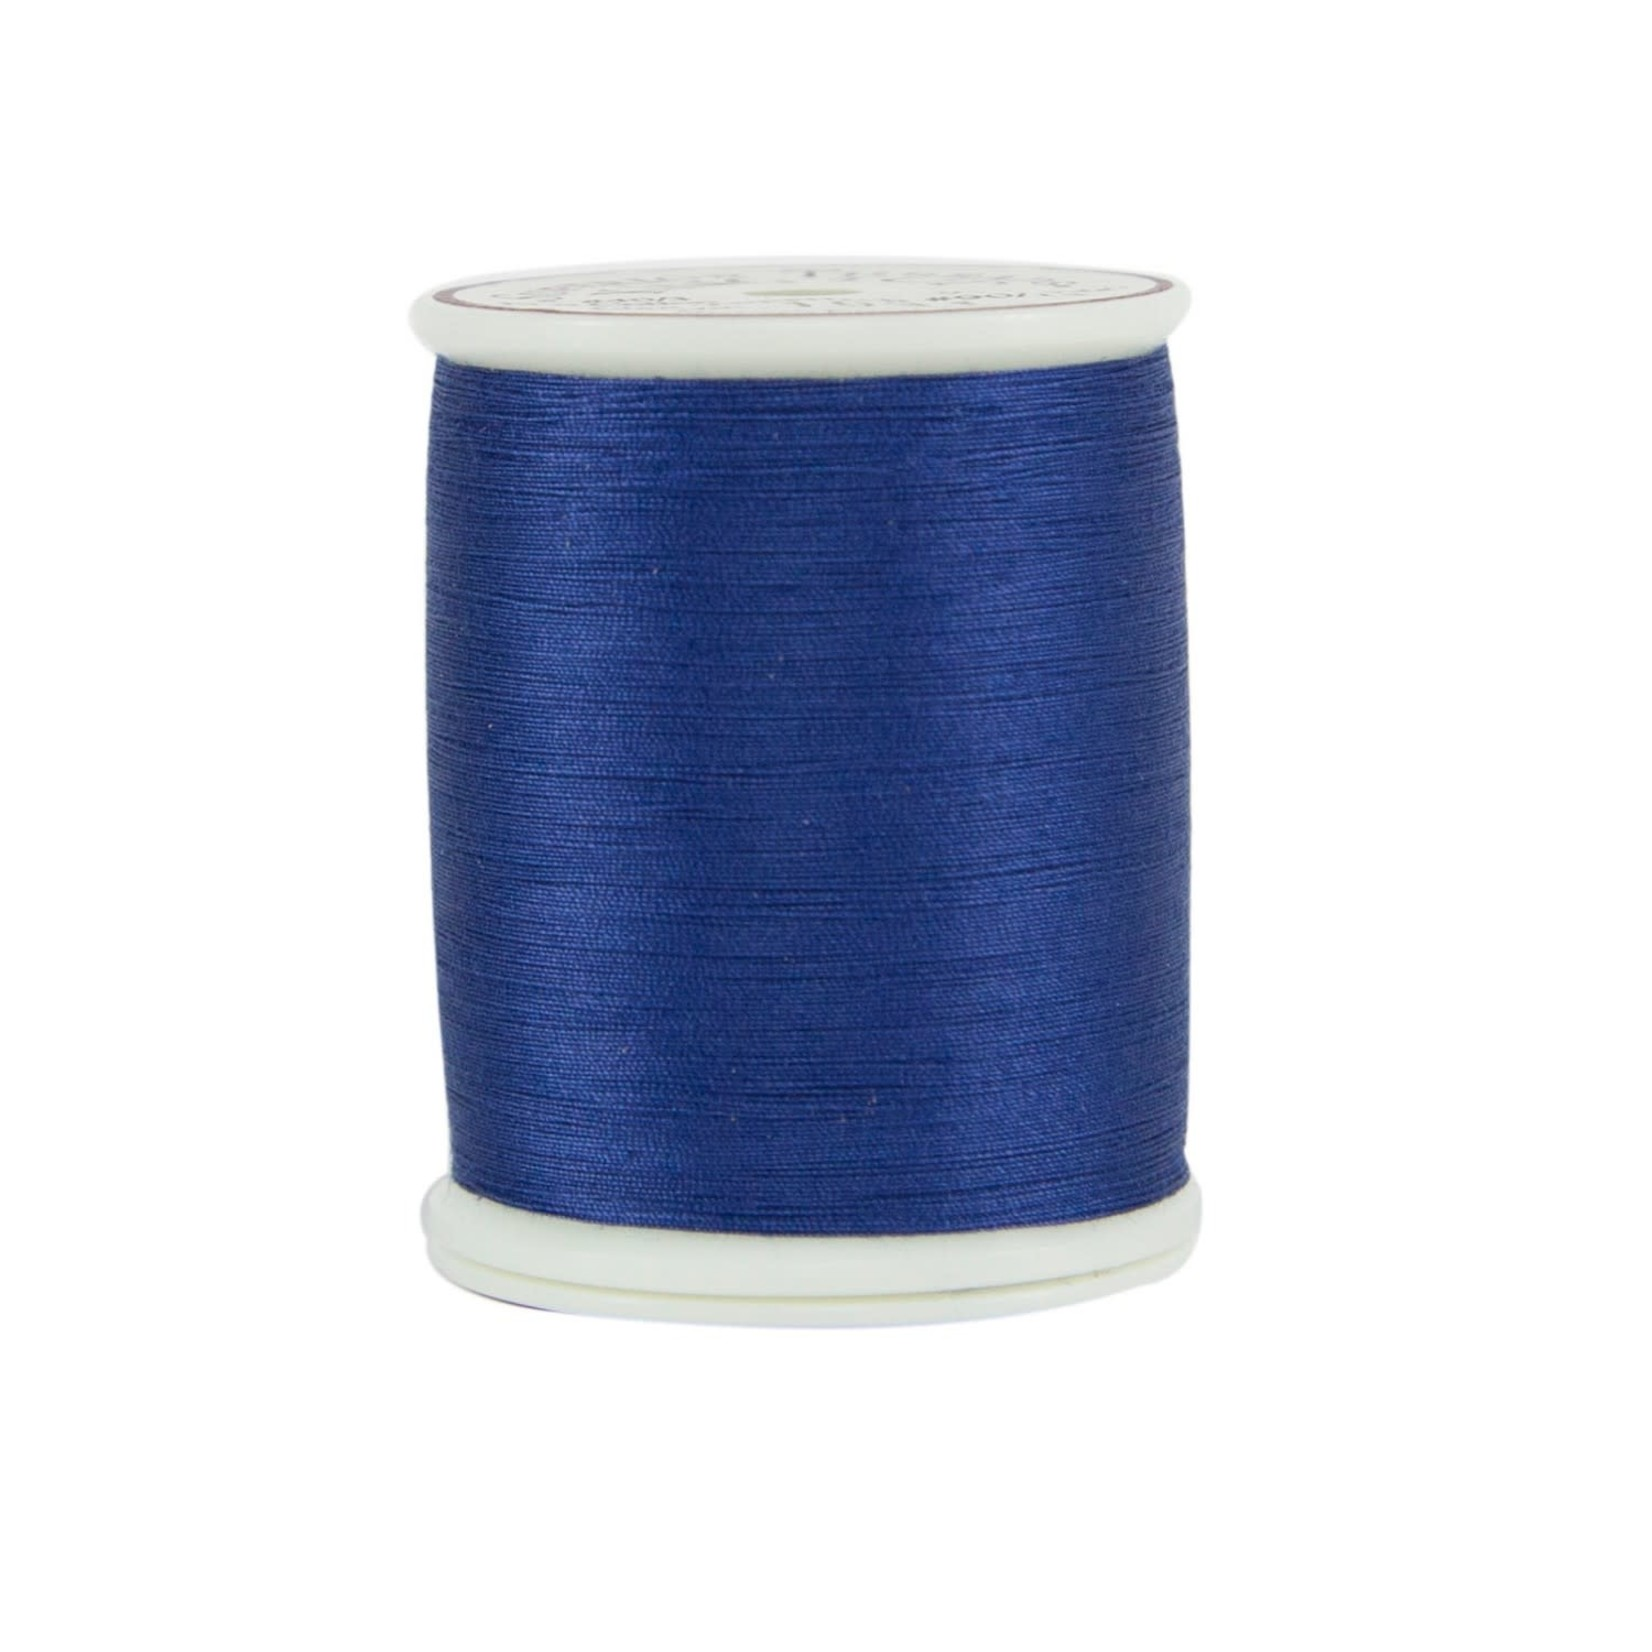 Superior Threads King Tut - #40 - 457 m - 1031 Edwardian Blue